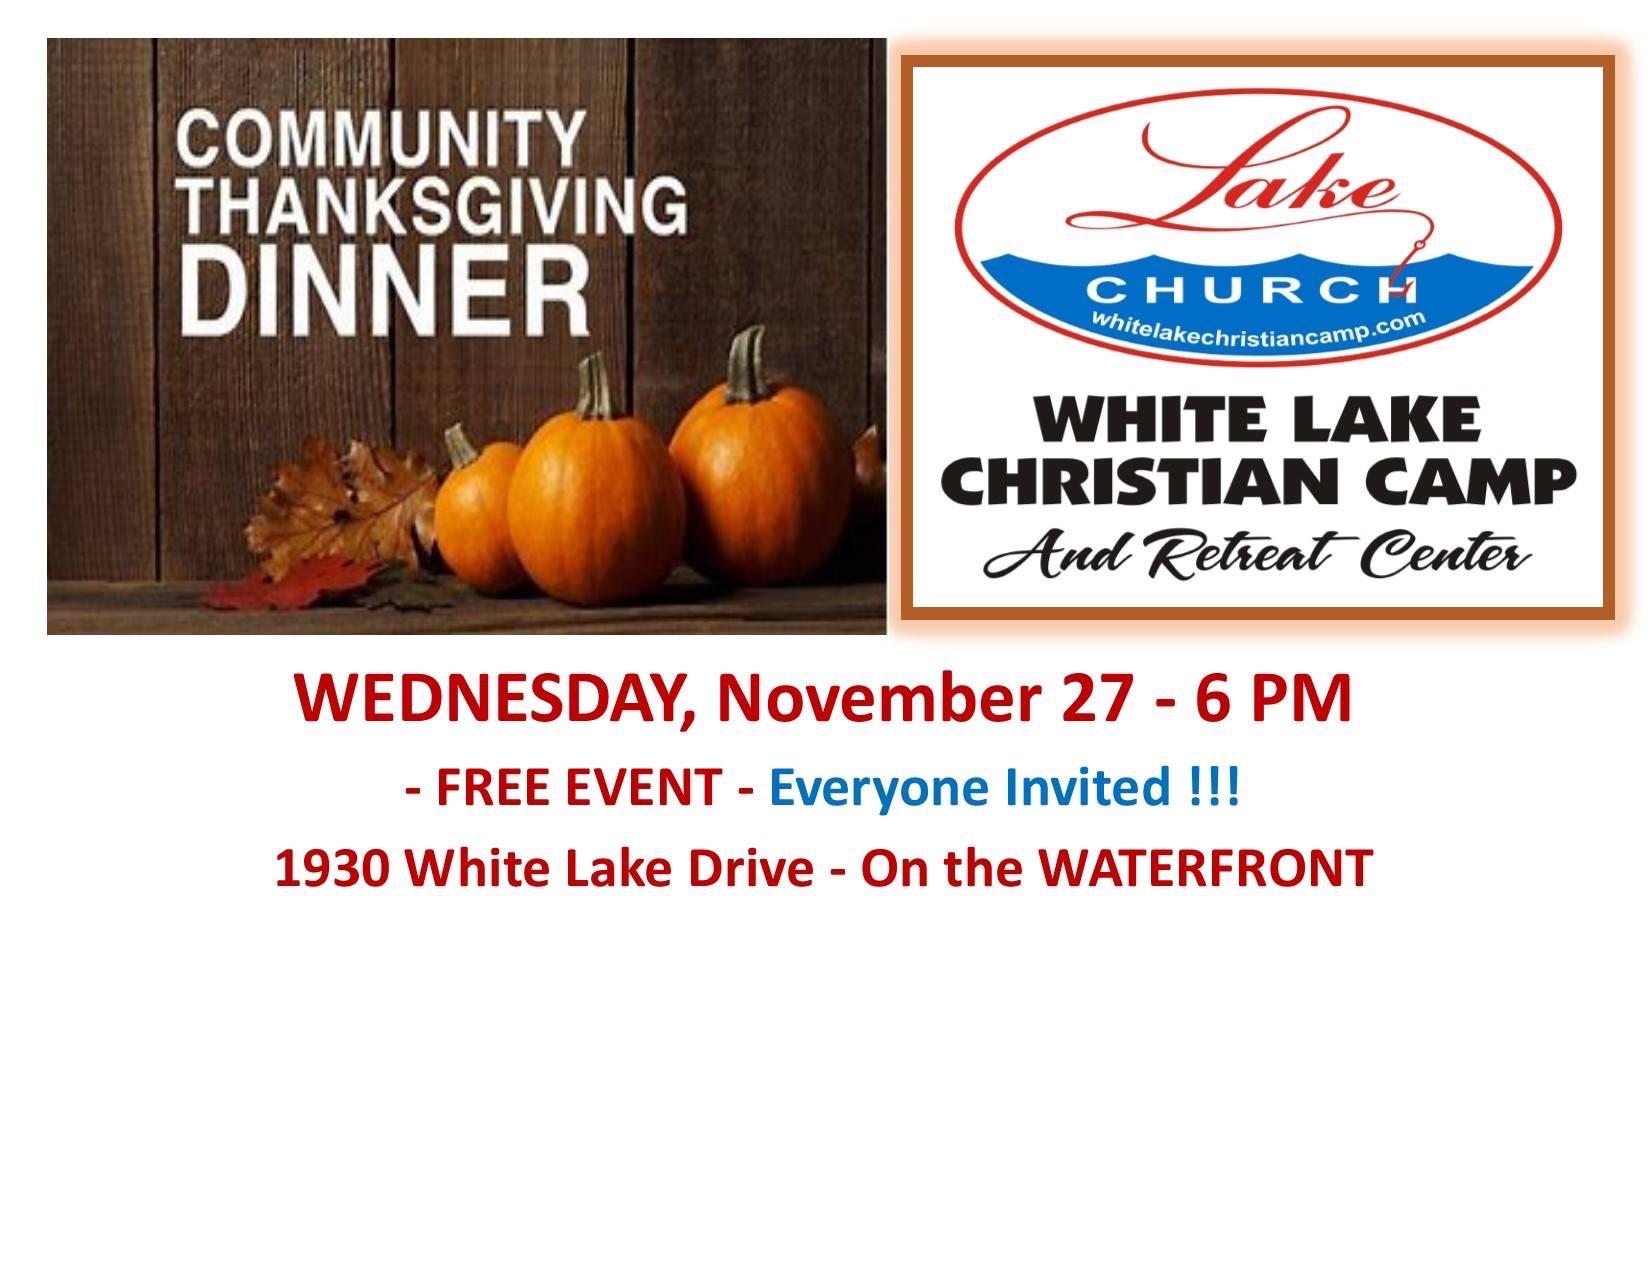 Lake Church dinner